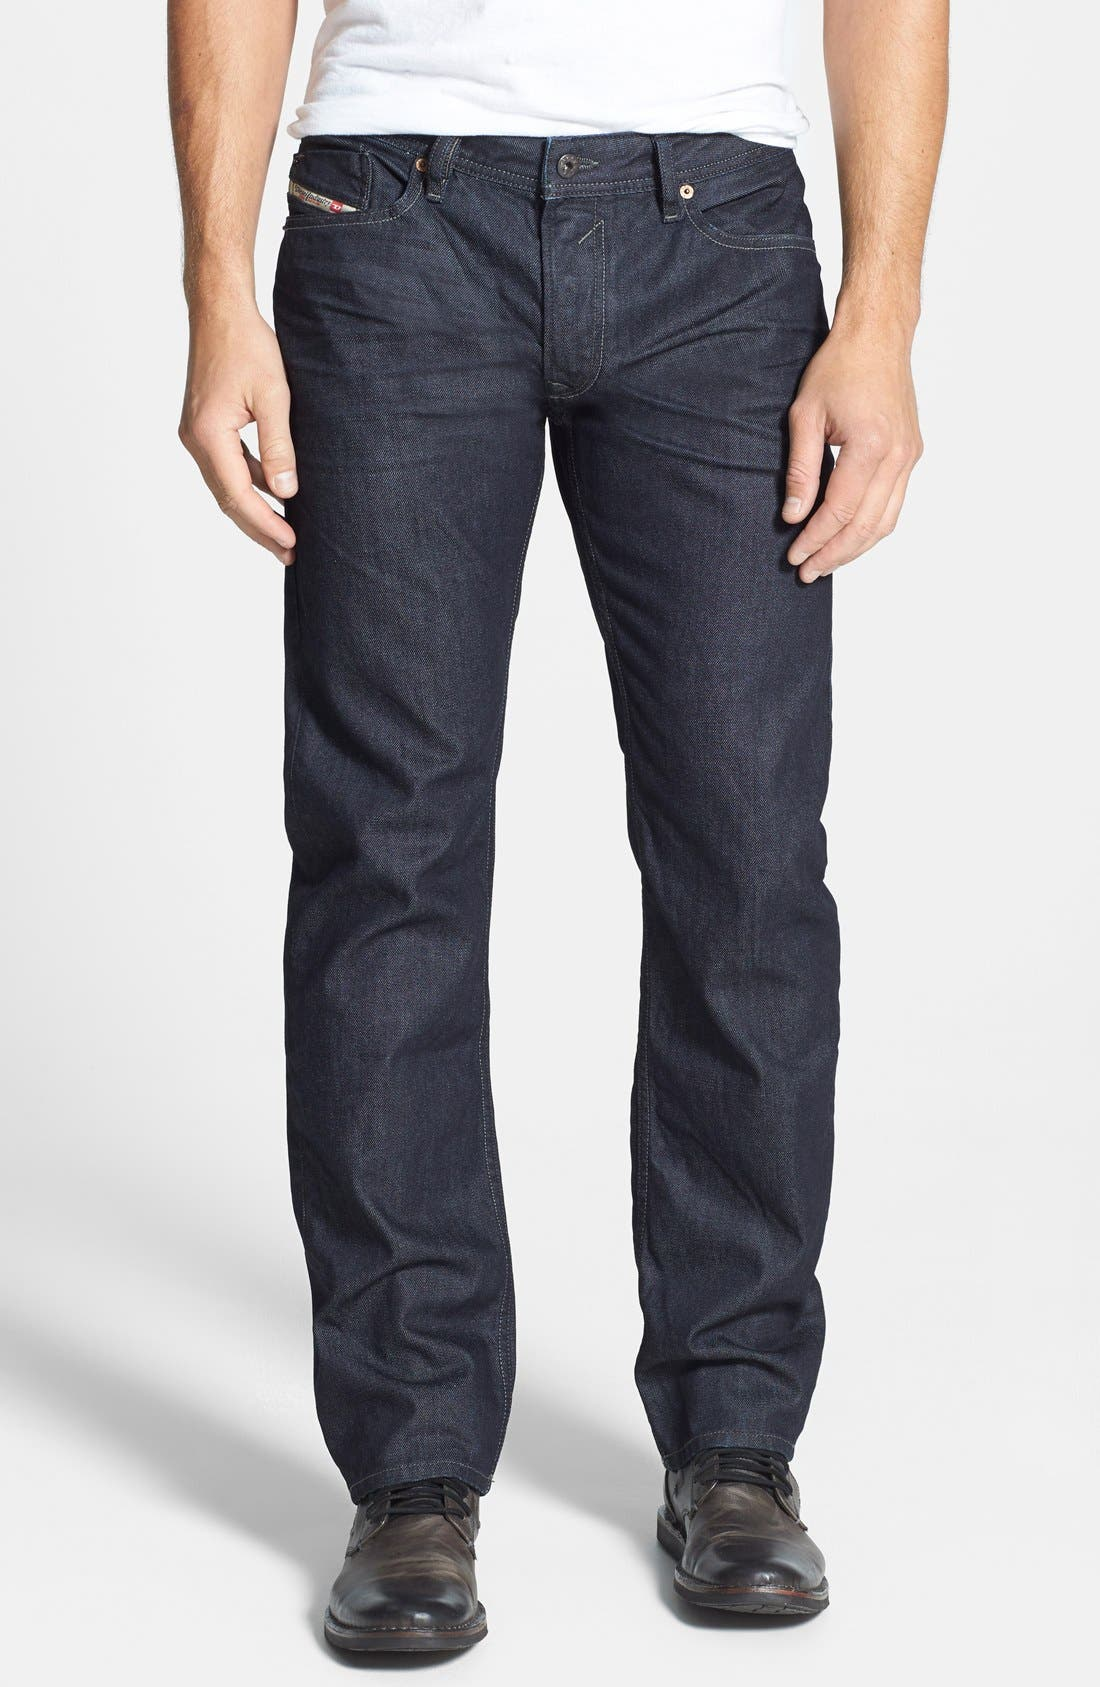 Waykee Straight Leg Jeans,                             Main thumbnail 1, color,                             0Z88